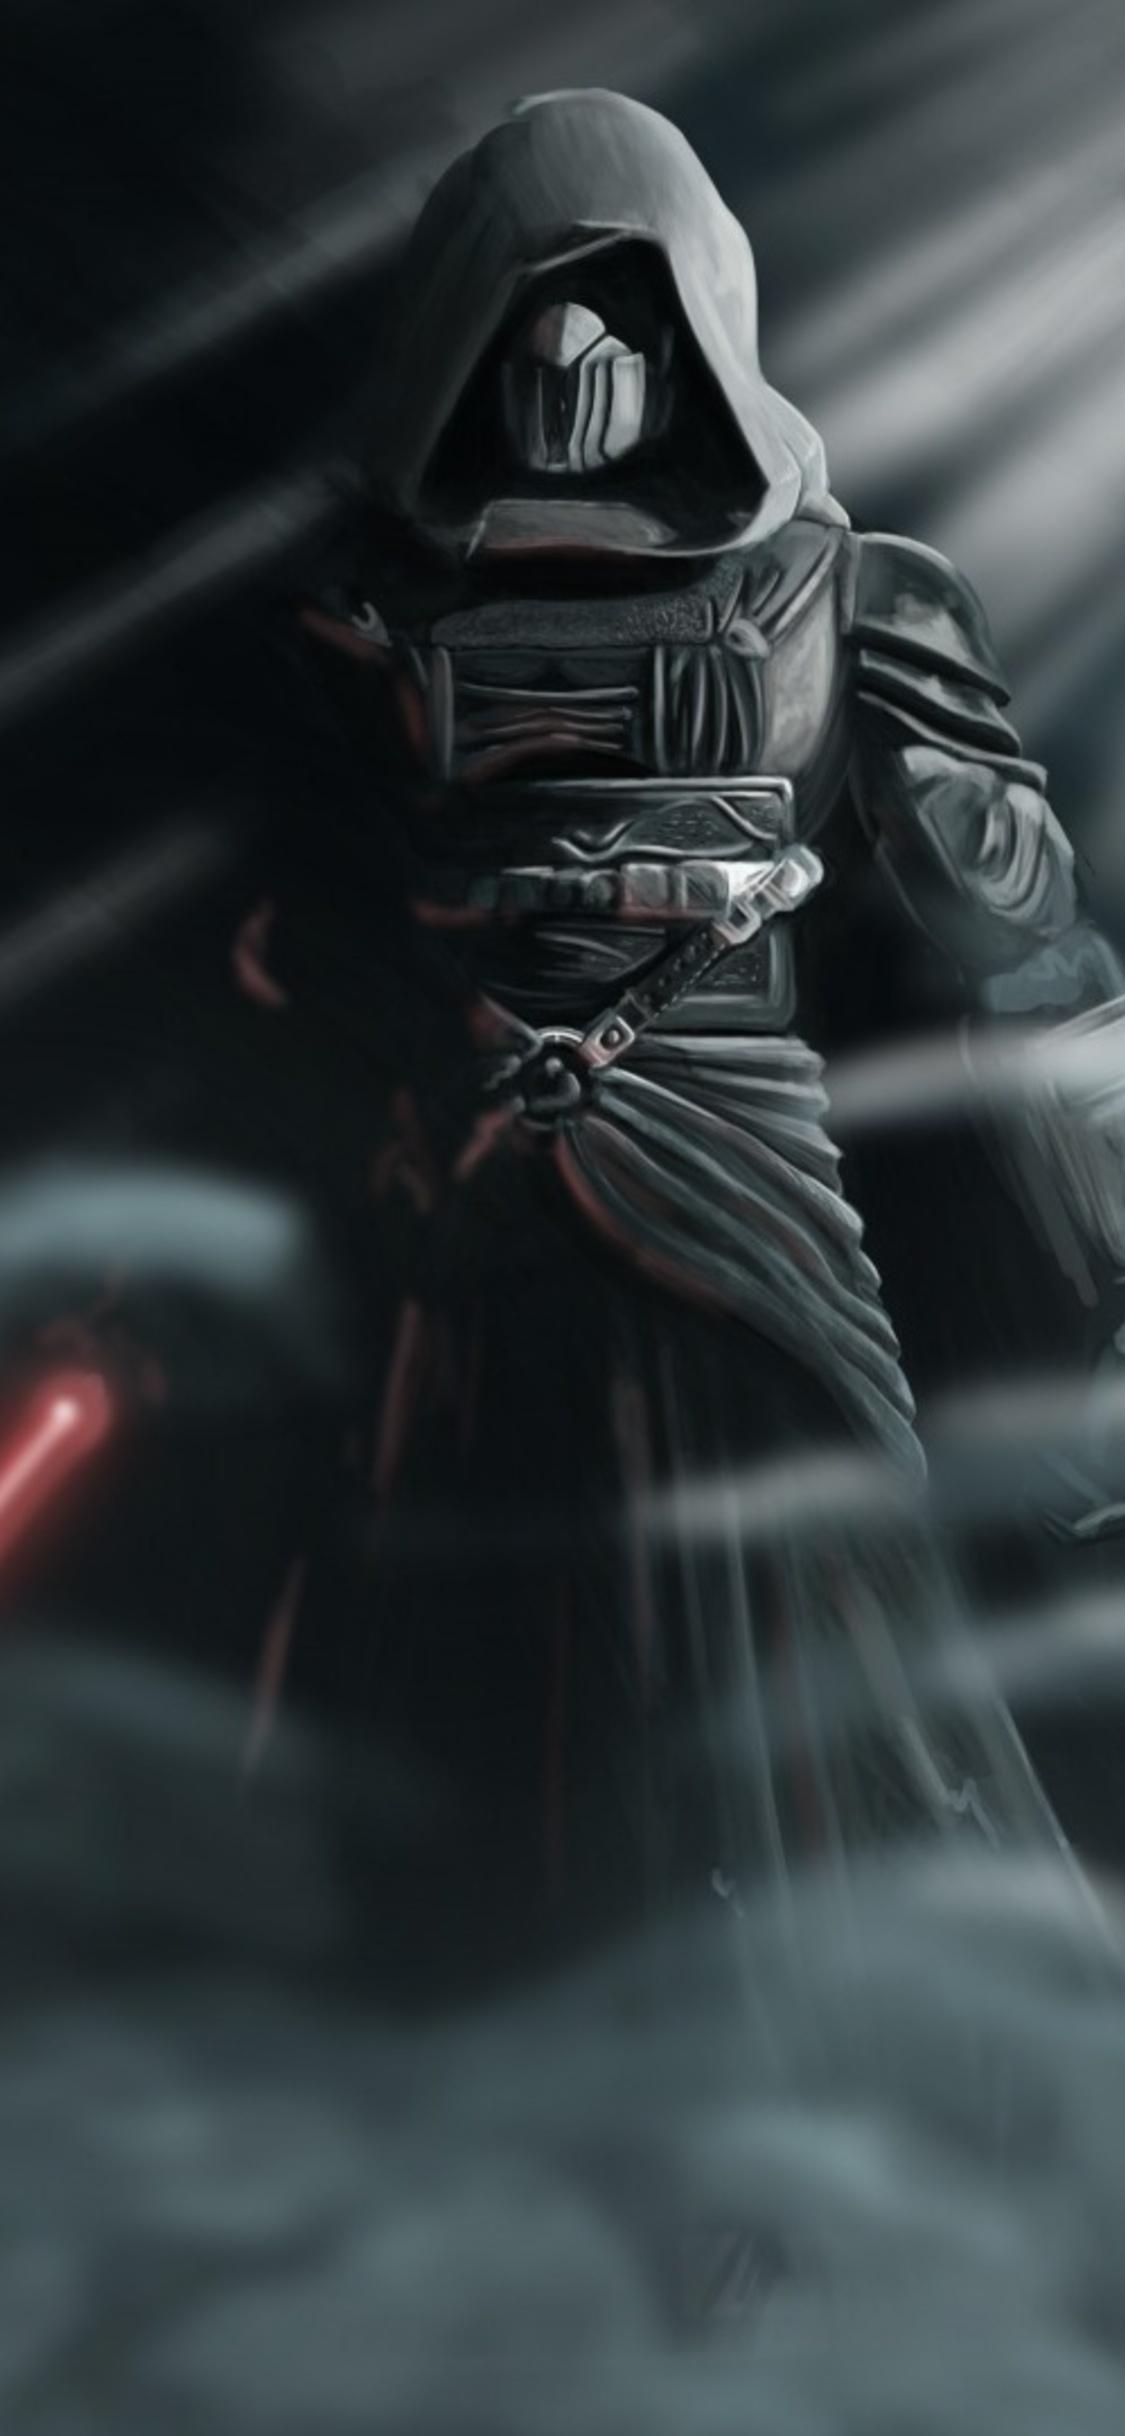 darth revan star wars with lightsaber o0